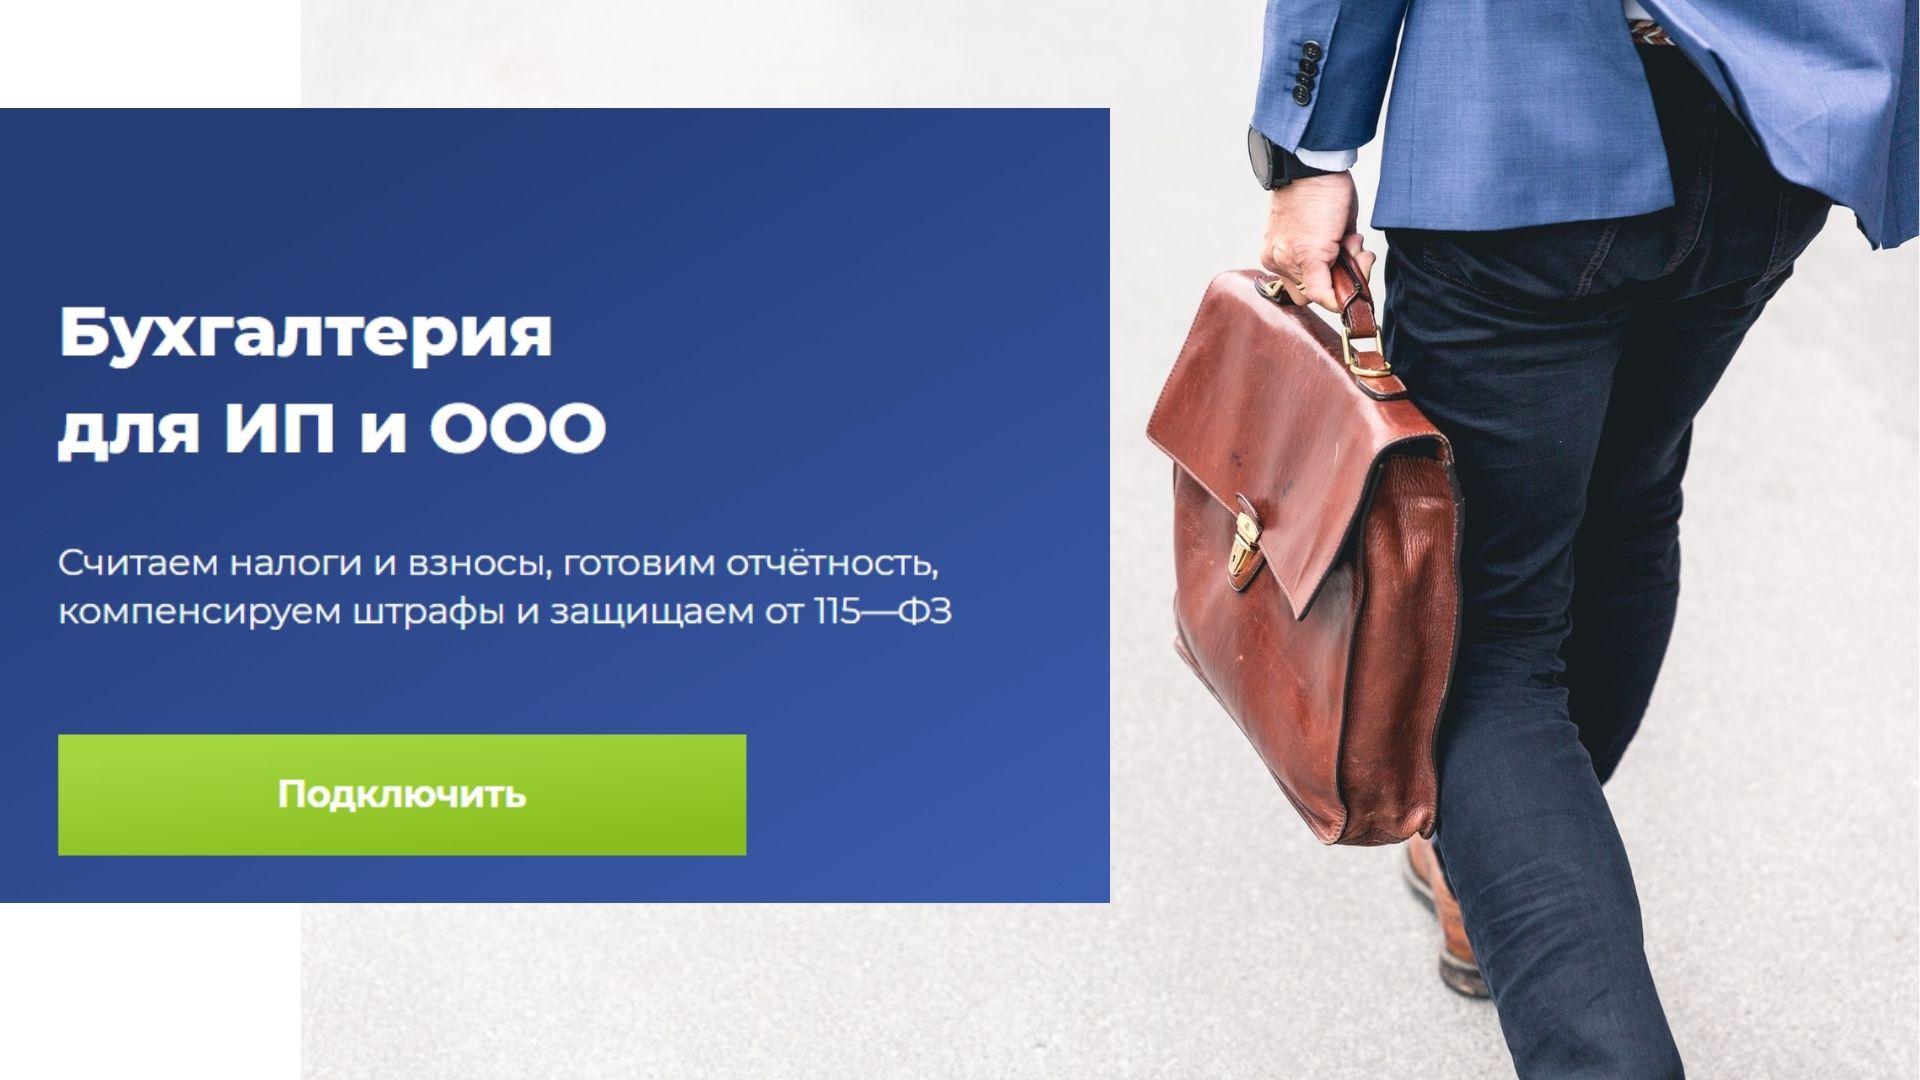 Модуль Банк ОНЛАЙН БУХГАЛТЕРИЯ для ип и ооо